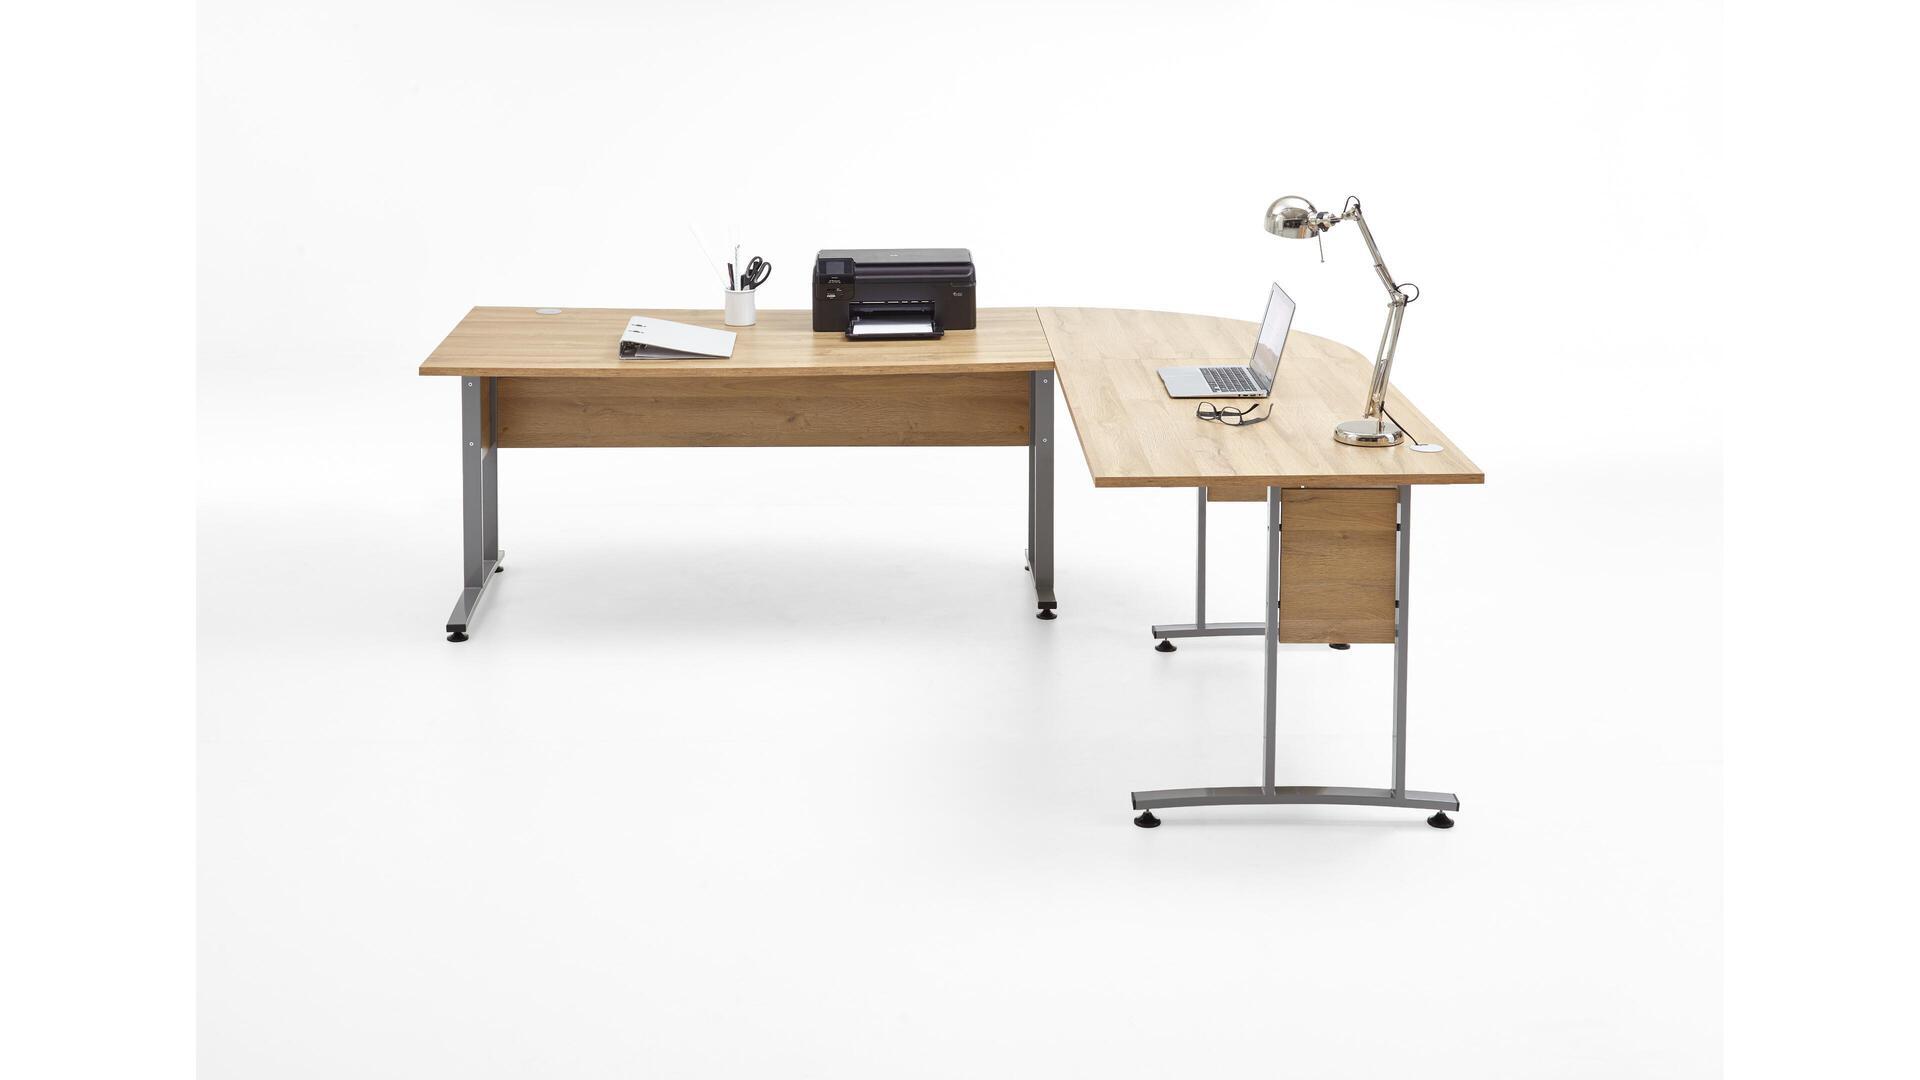 Eckschreibtisch als Büromöbel